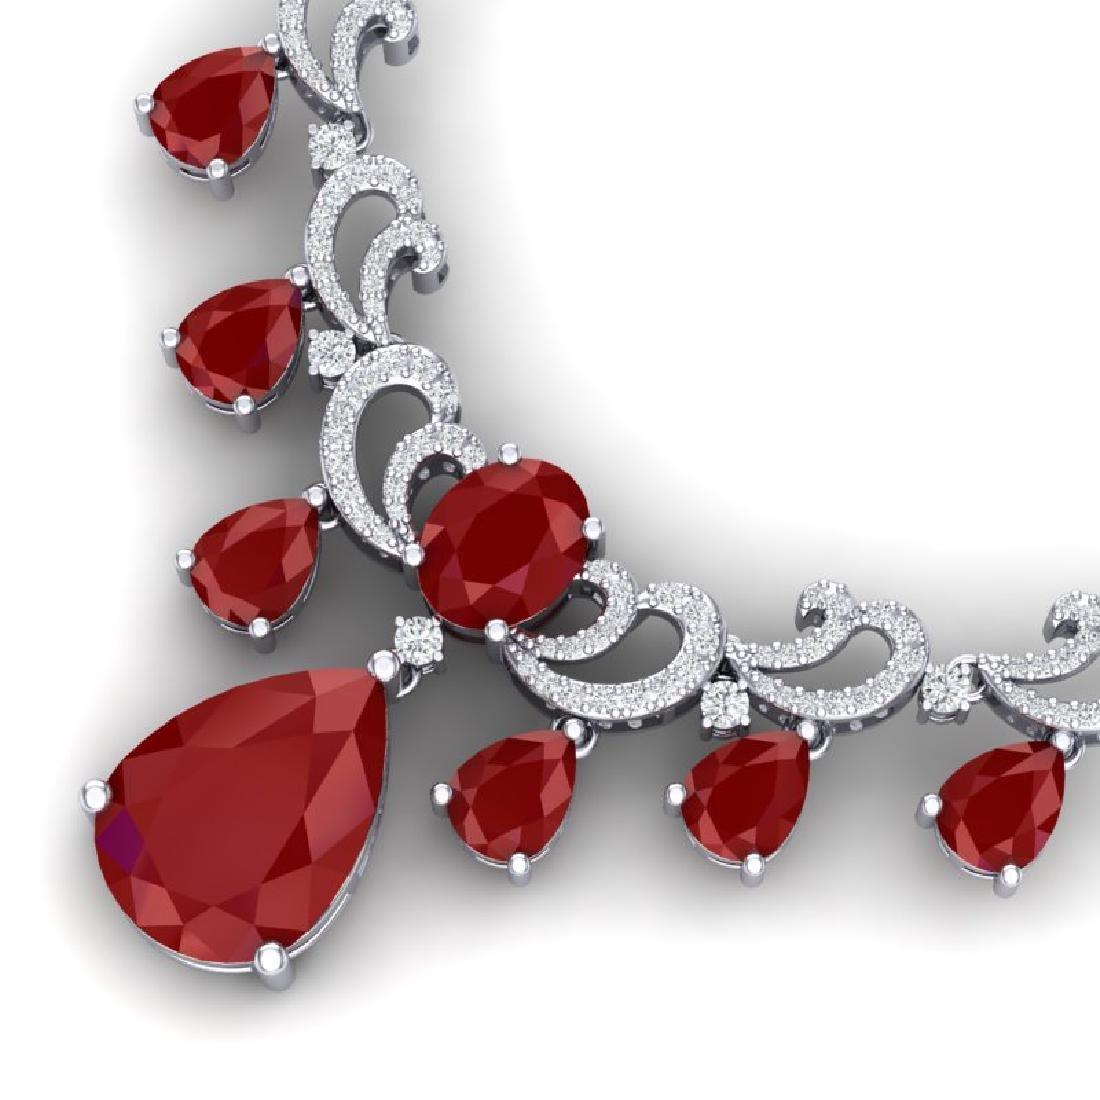 36.85 CTW Royalty Ruby & VS Diamond Necklace 18K White - 2